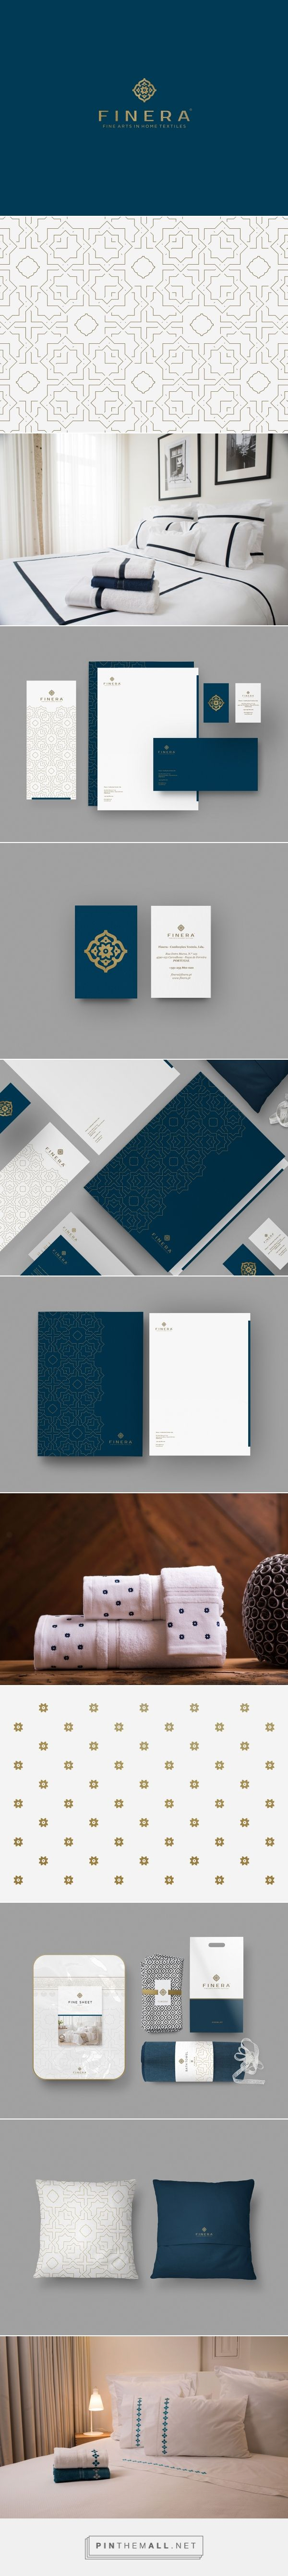 Finera Home Textile Branding by Bullseye  | Fivestar Branding Agency – Design and Branding Agency & Curated Inspiration Gallery